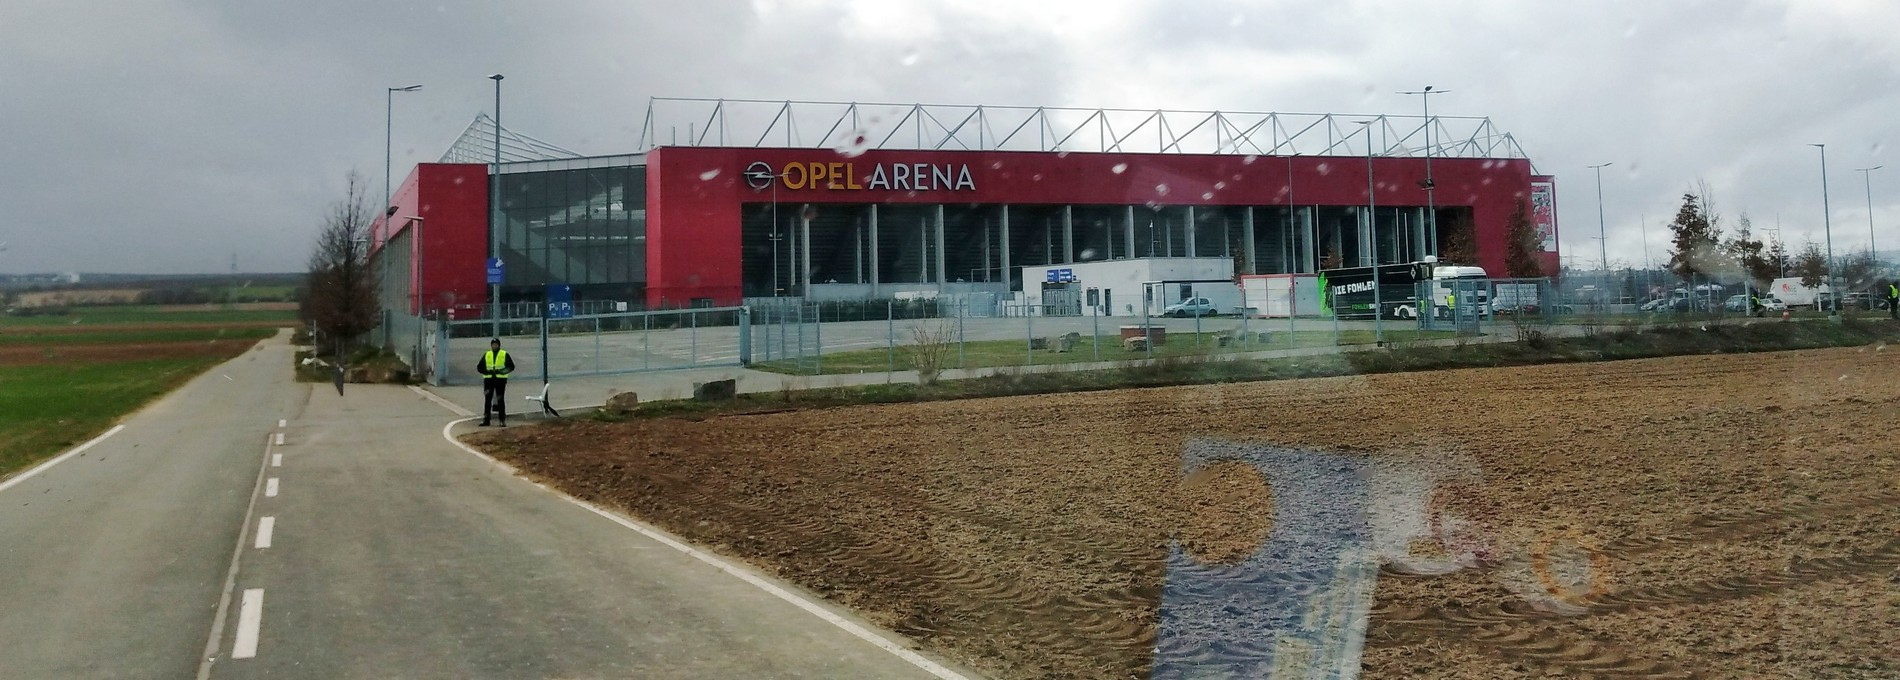 Ankunft Opel Arena